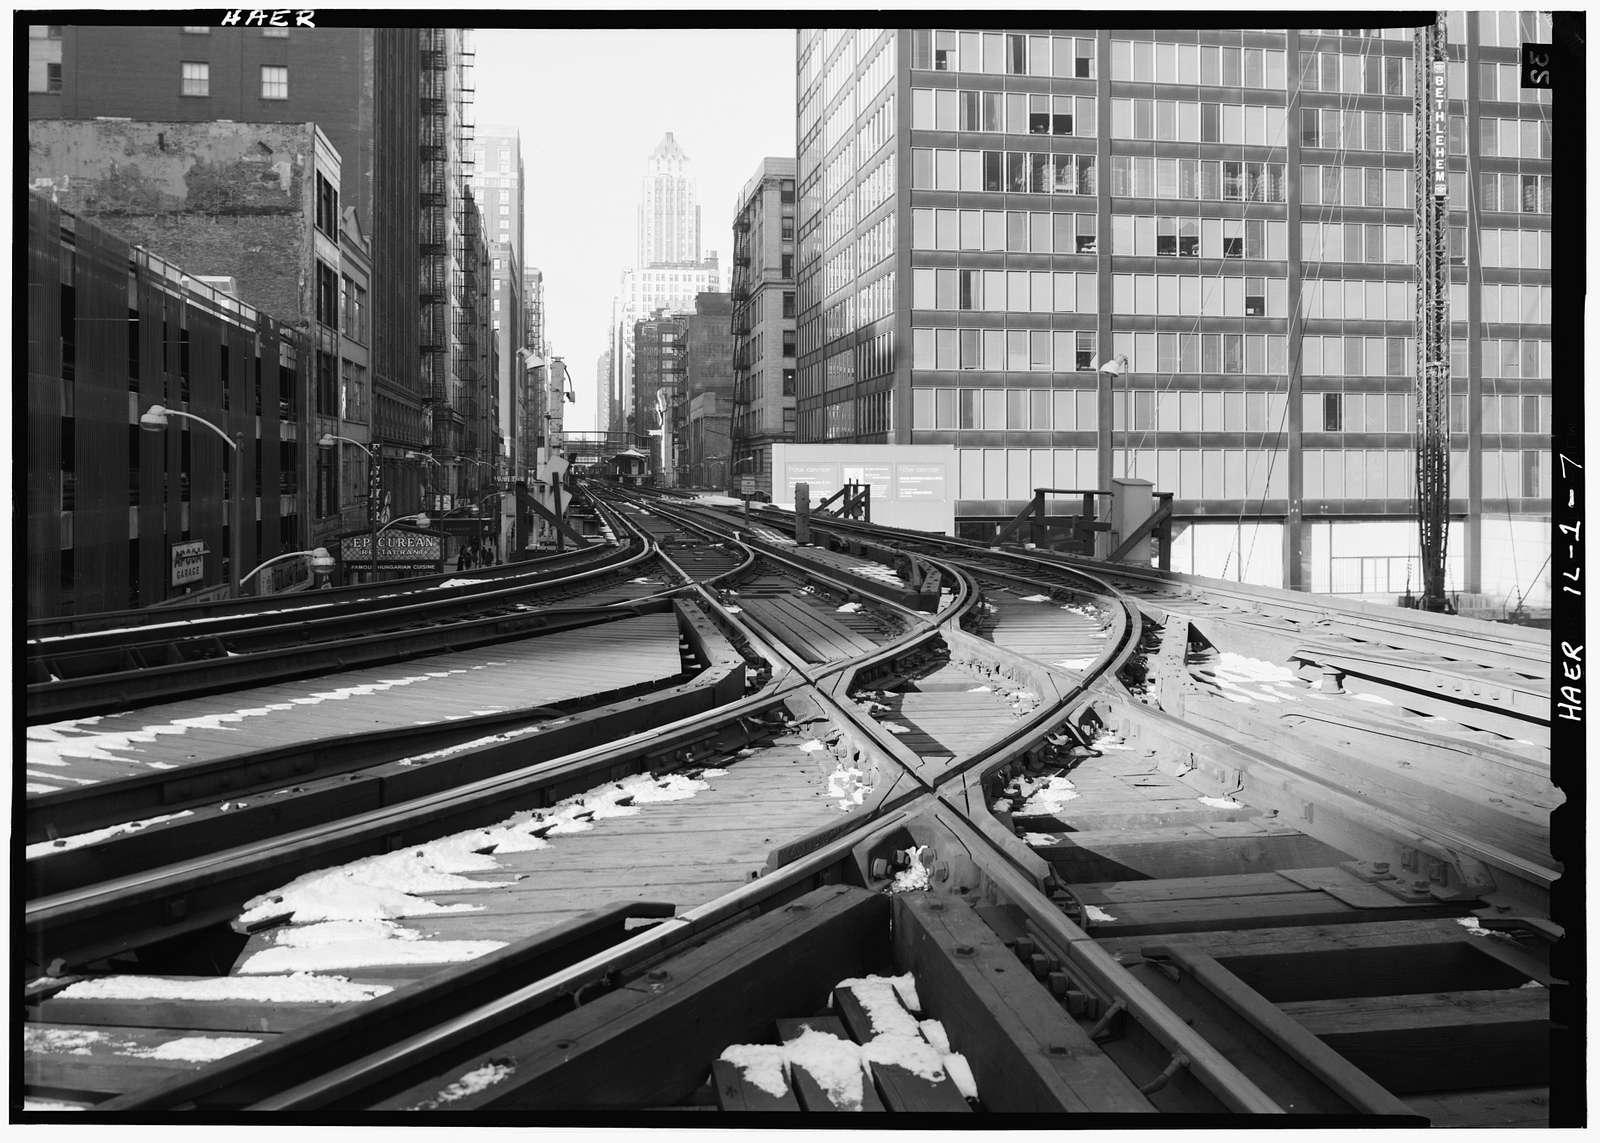 Union Elevated Railroad, Union Loop, Wells, Van Buren, Lake Streets & Wabash Avenue, Chicago, Cook County, IL